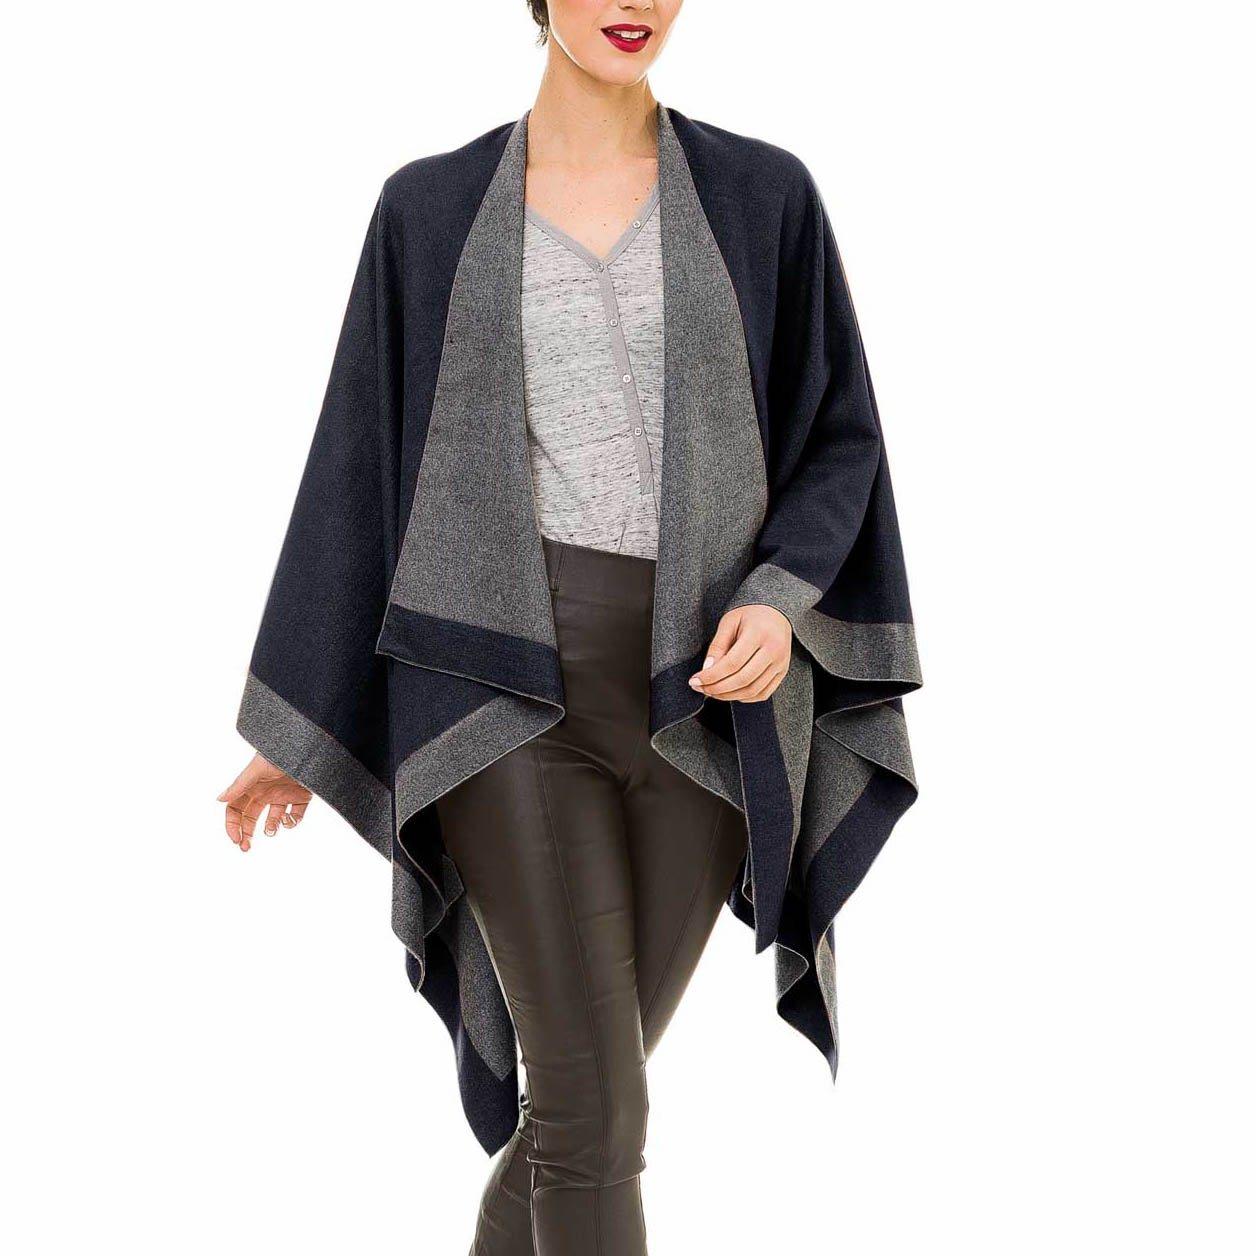 Cardigan Poncho Cape: Women Elegant Gray Camel Cardigan Shawl Wrap Sweater Coat for Winter (Gray Navy)